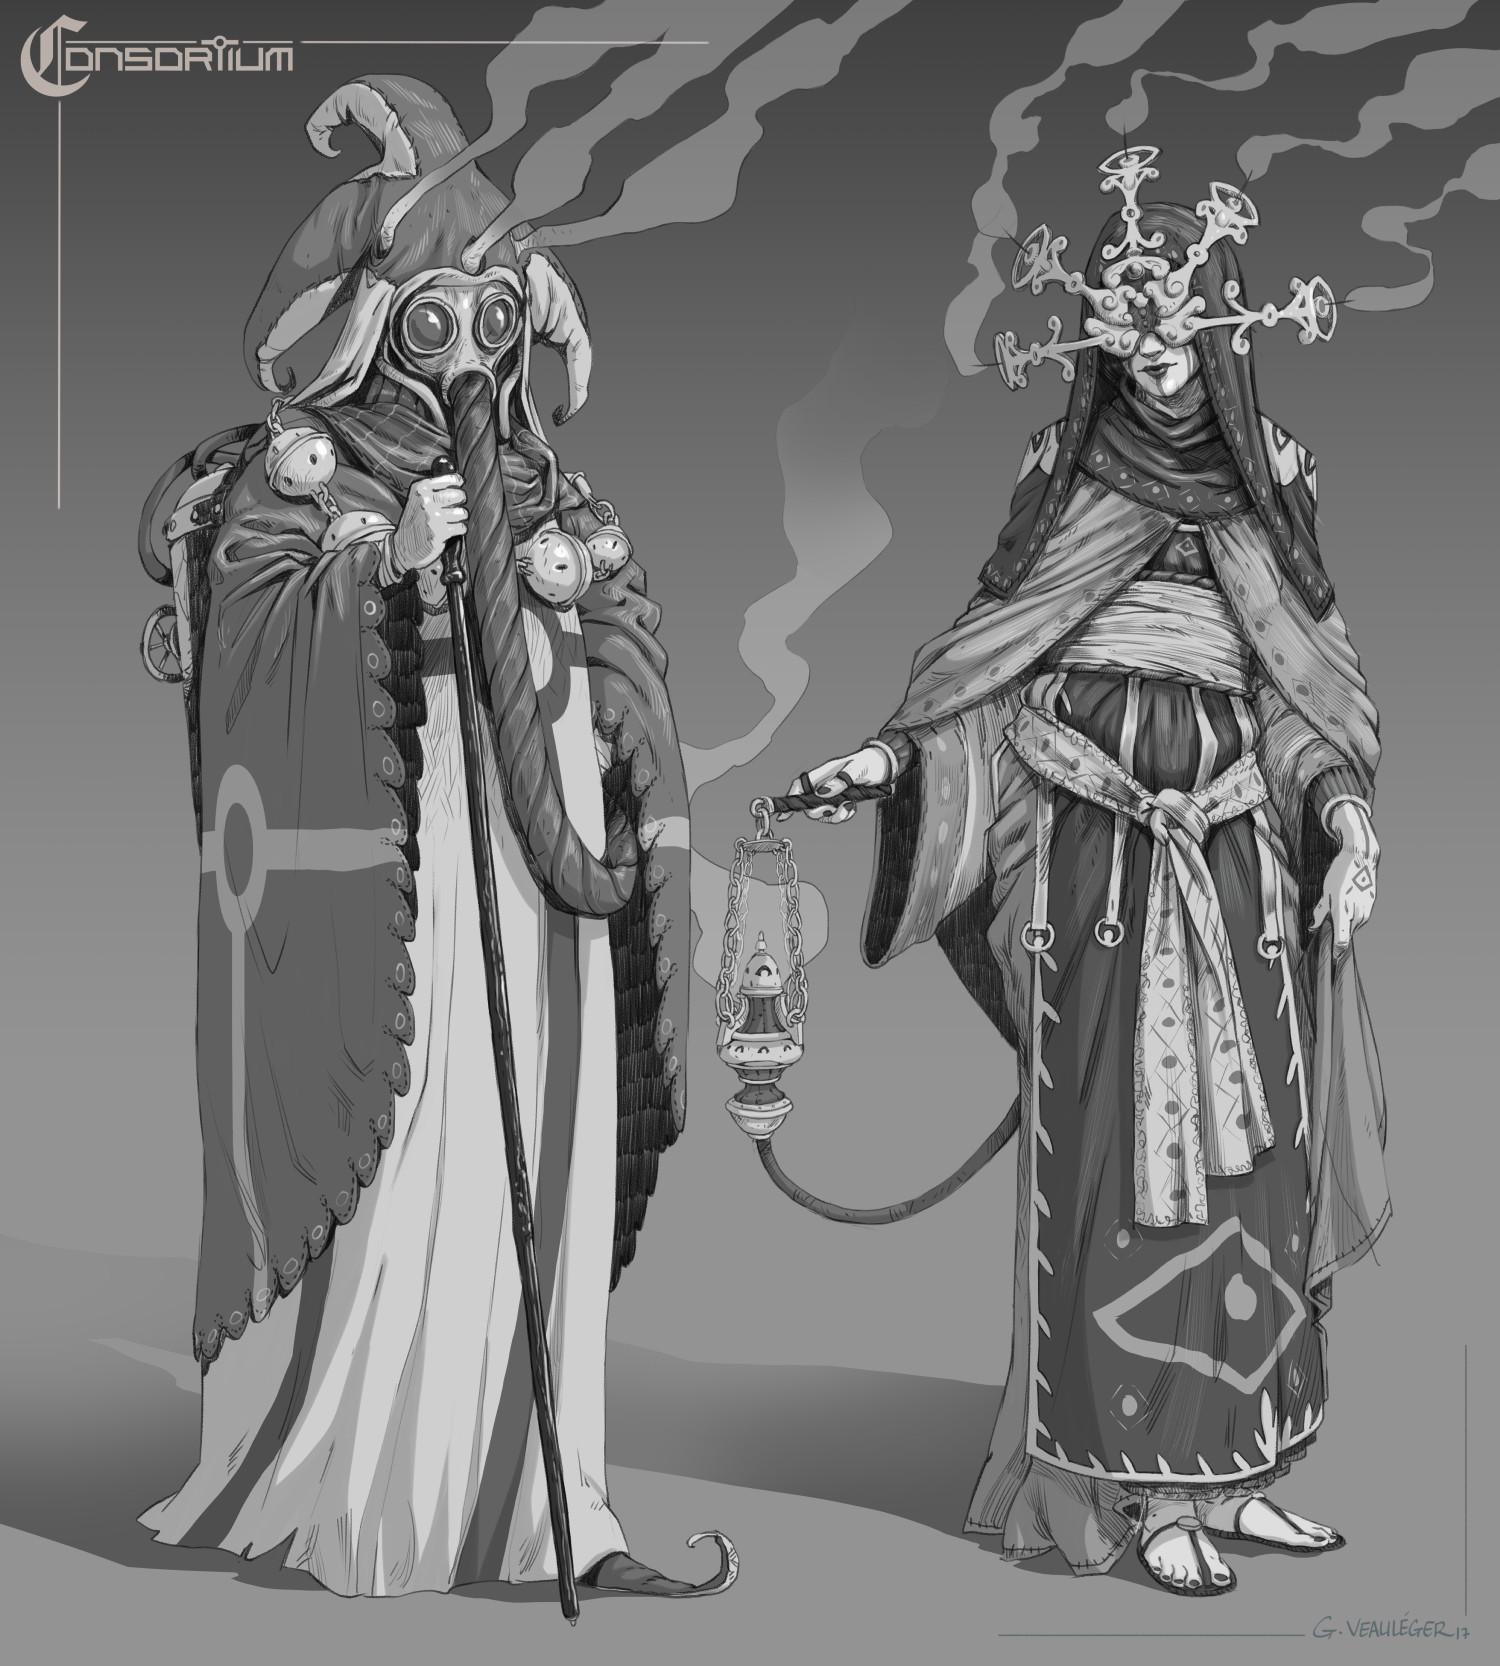 Gregoire veauleger gregoire veauleger consortium priests